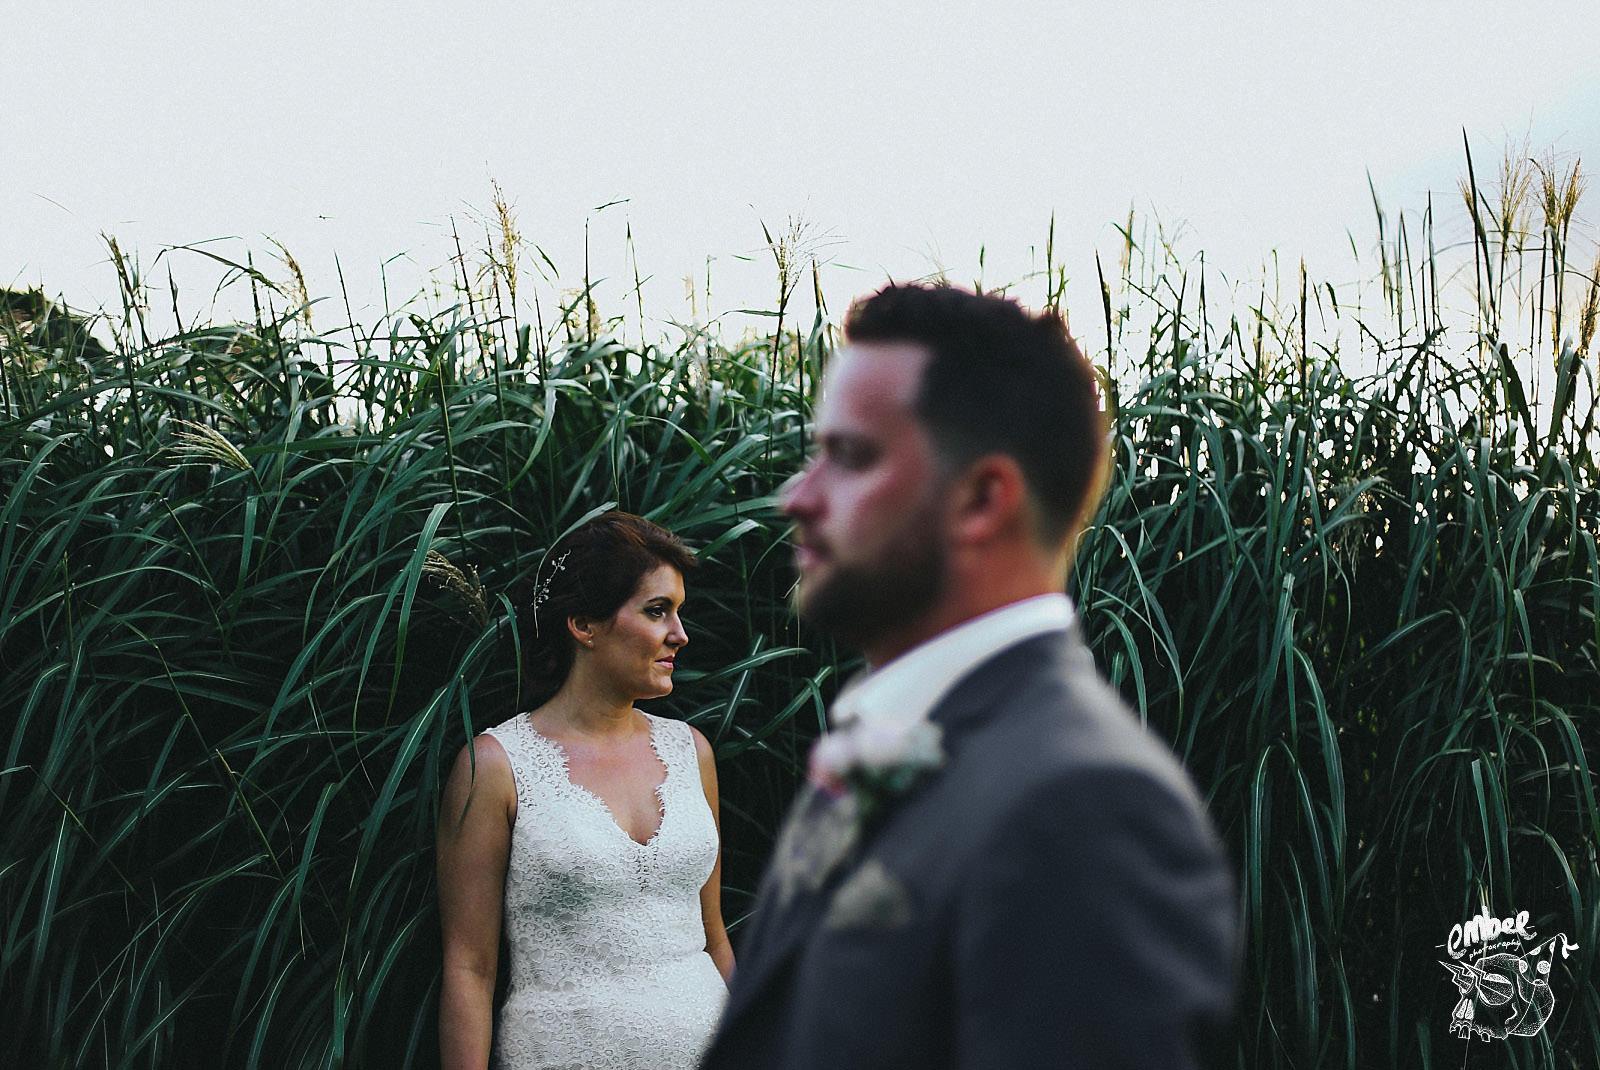 bride and groom looking opposite ways